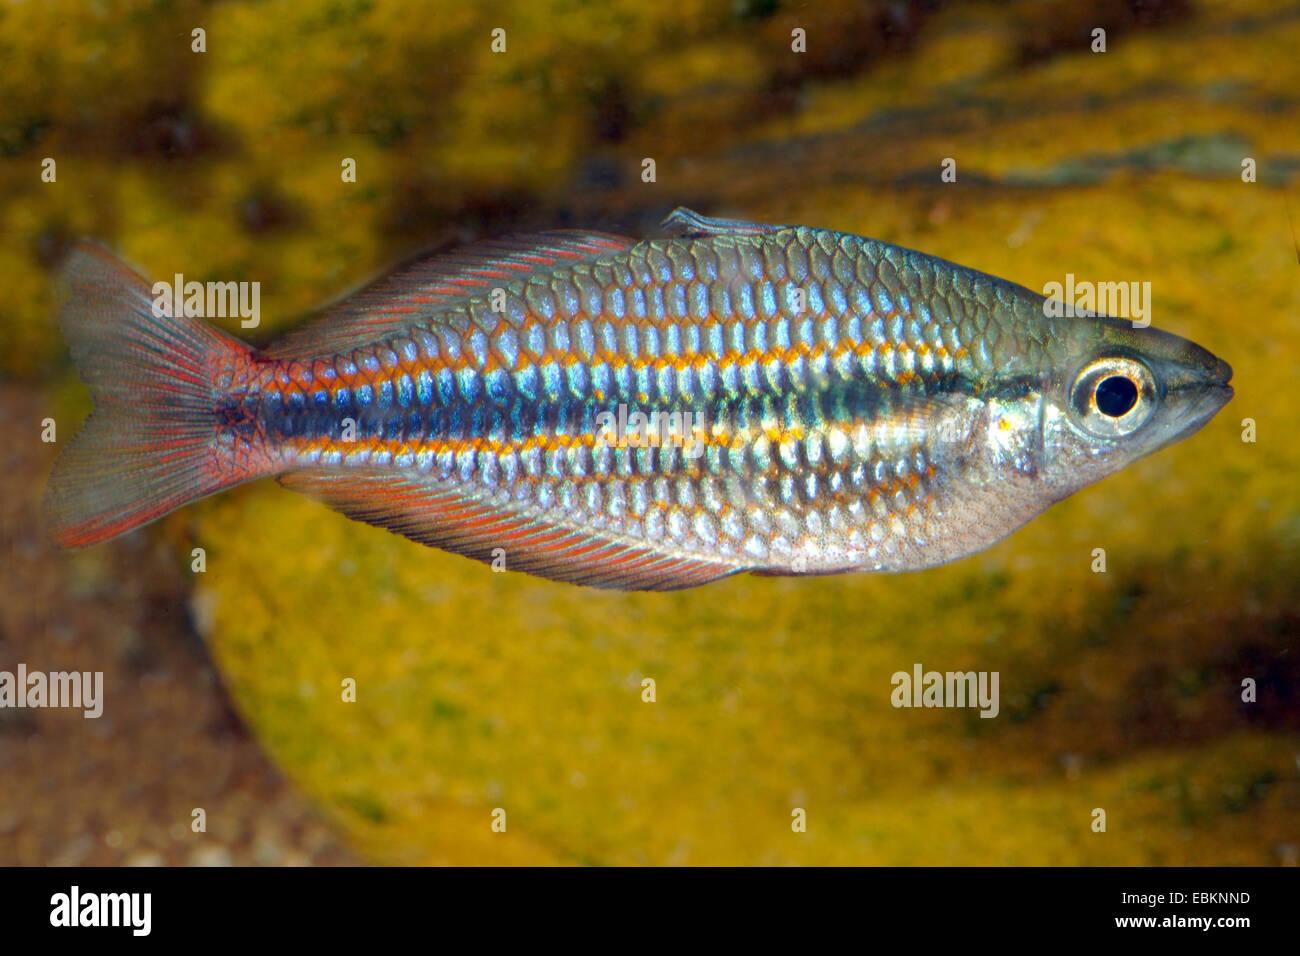 Goyder river rainbowfish (Melanotaenia trifasciata), full length format - Stock Image